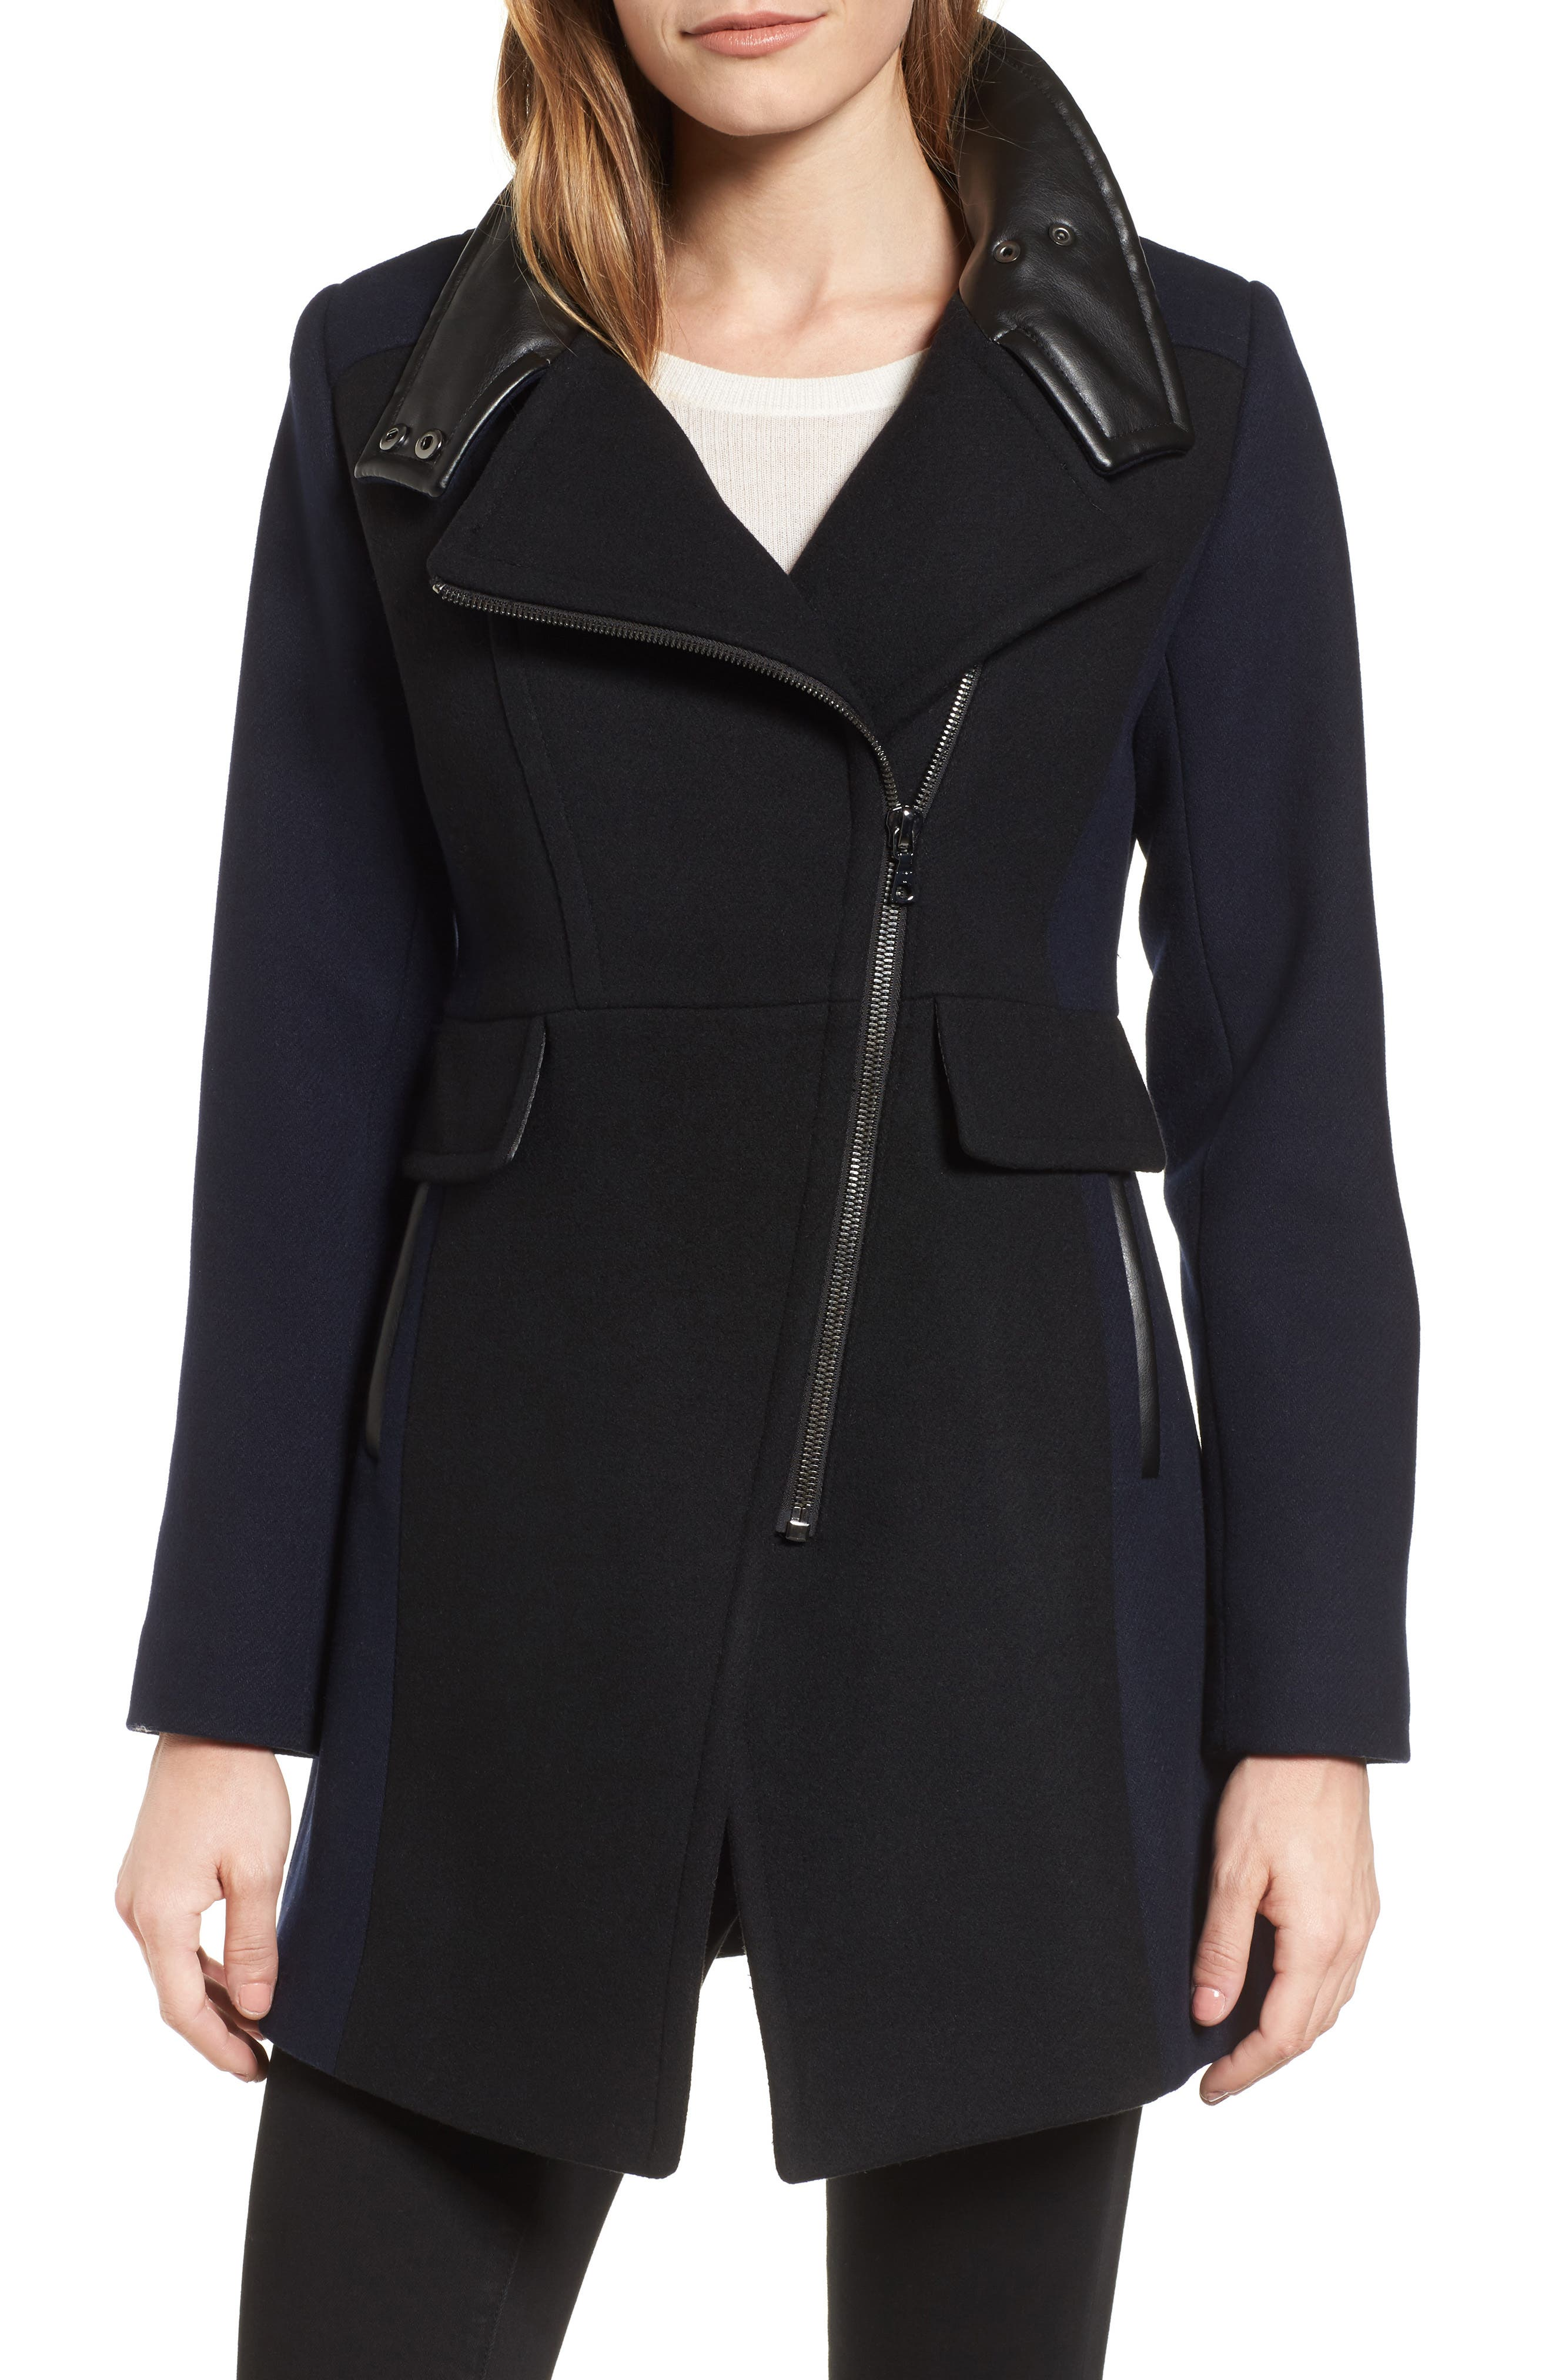 Eleanor Leather Trim Wool Blend Coat,                             Main thumbnail 1, color,                             002